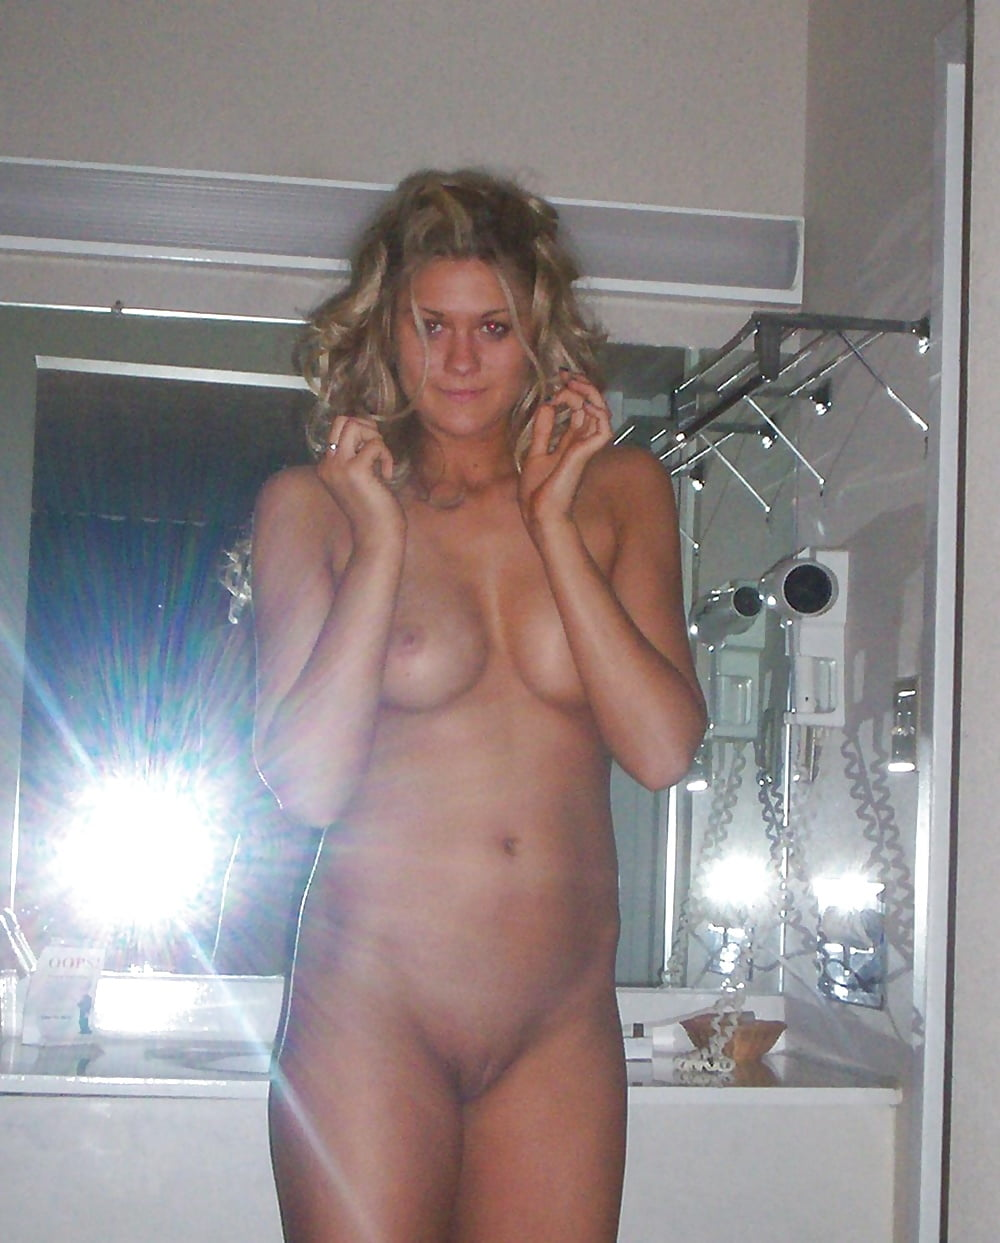 Norwegian spy nude gf — pic 1